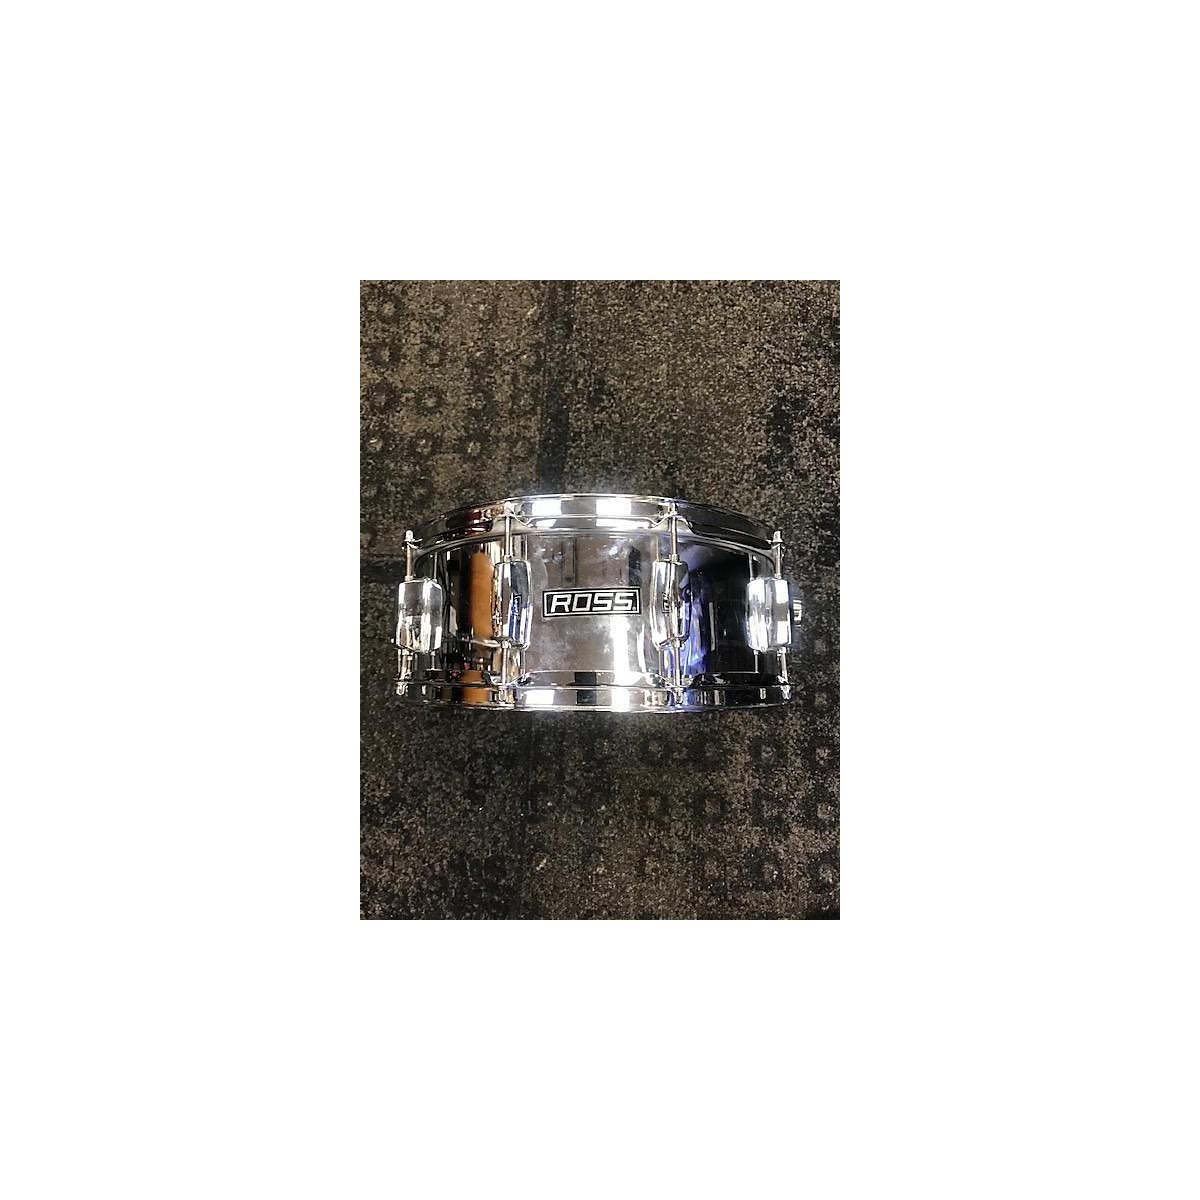 Ross 5.5X14 SNARE KIT Drum